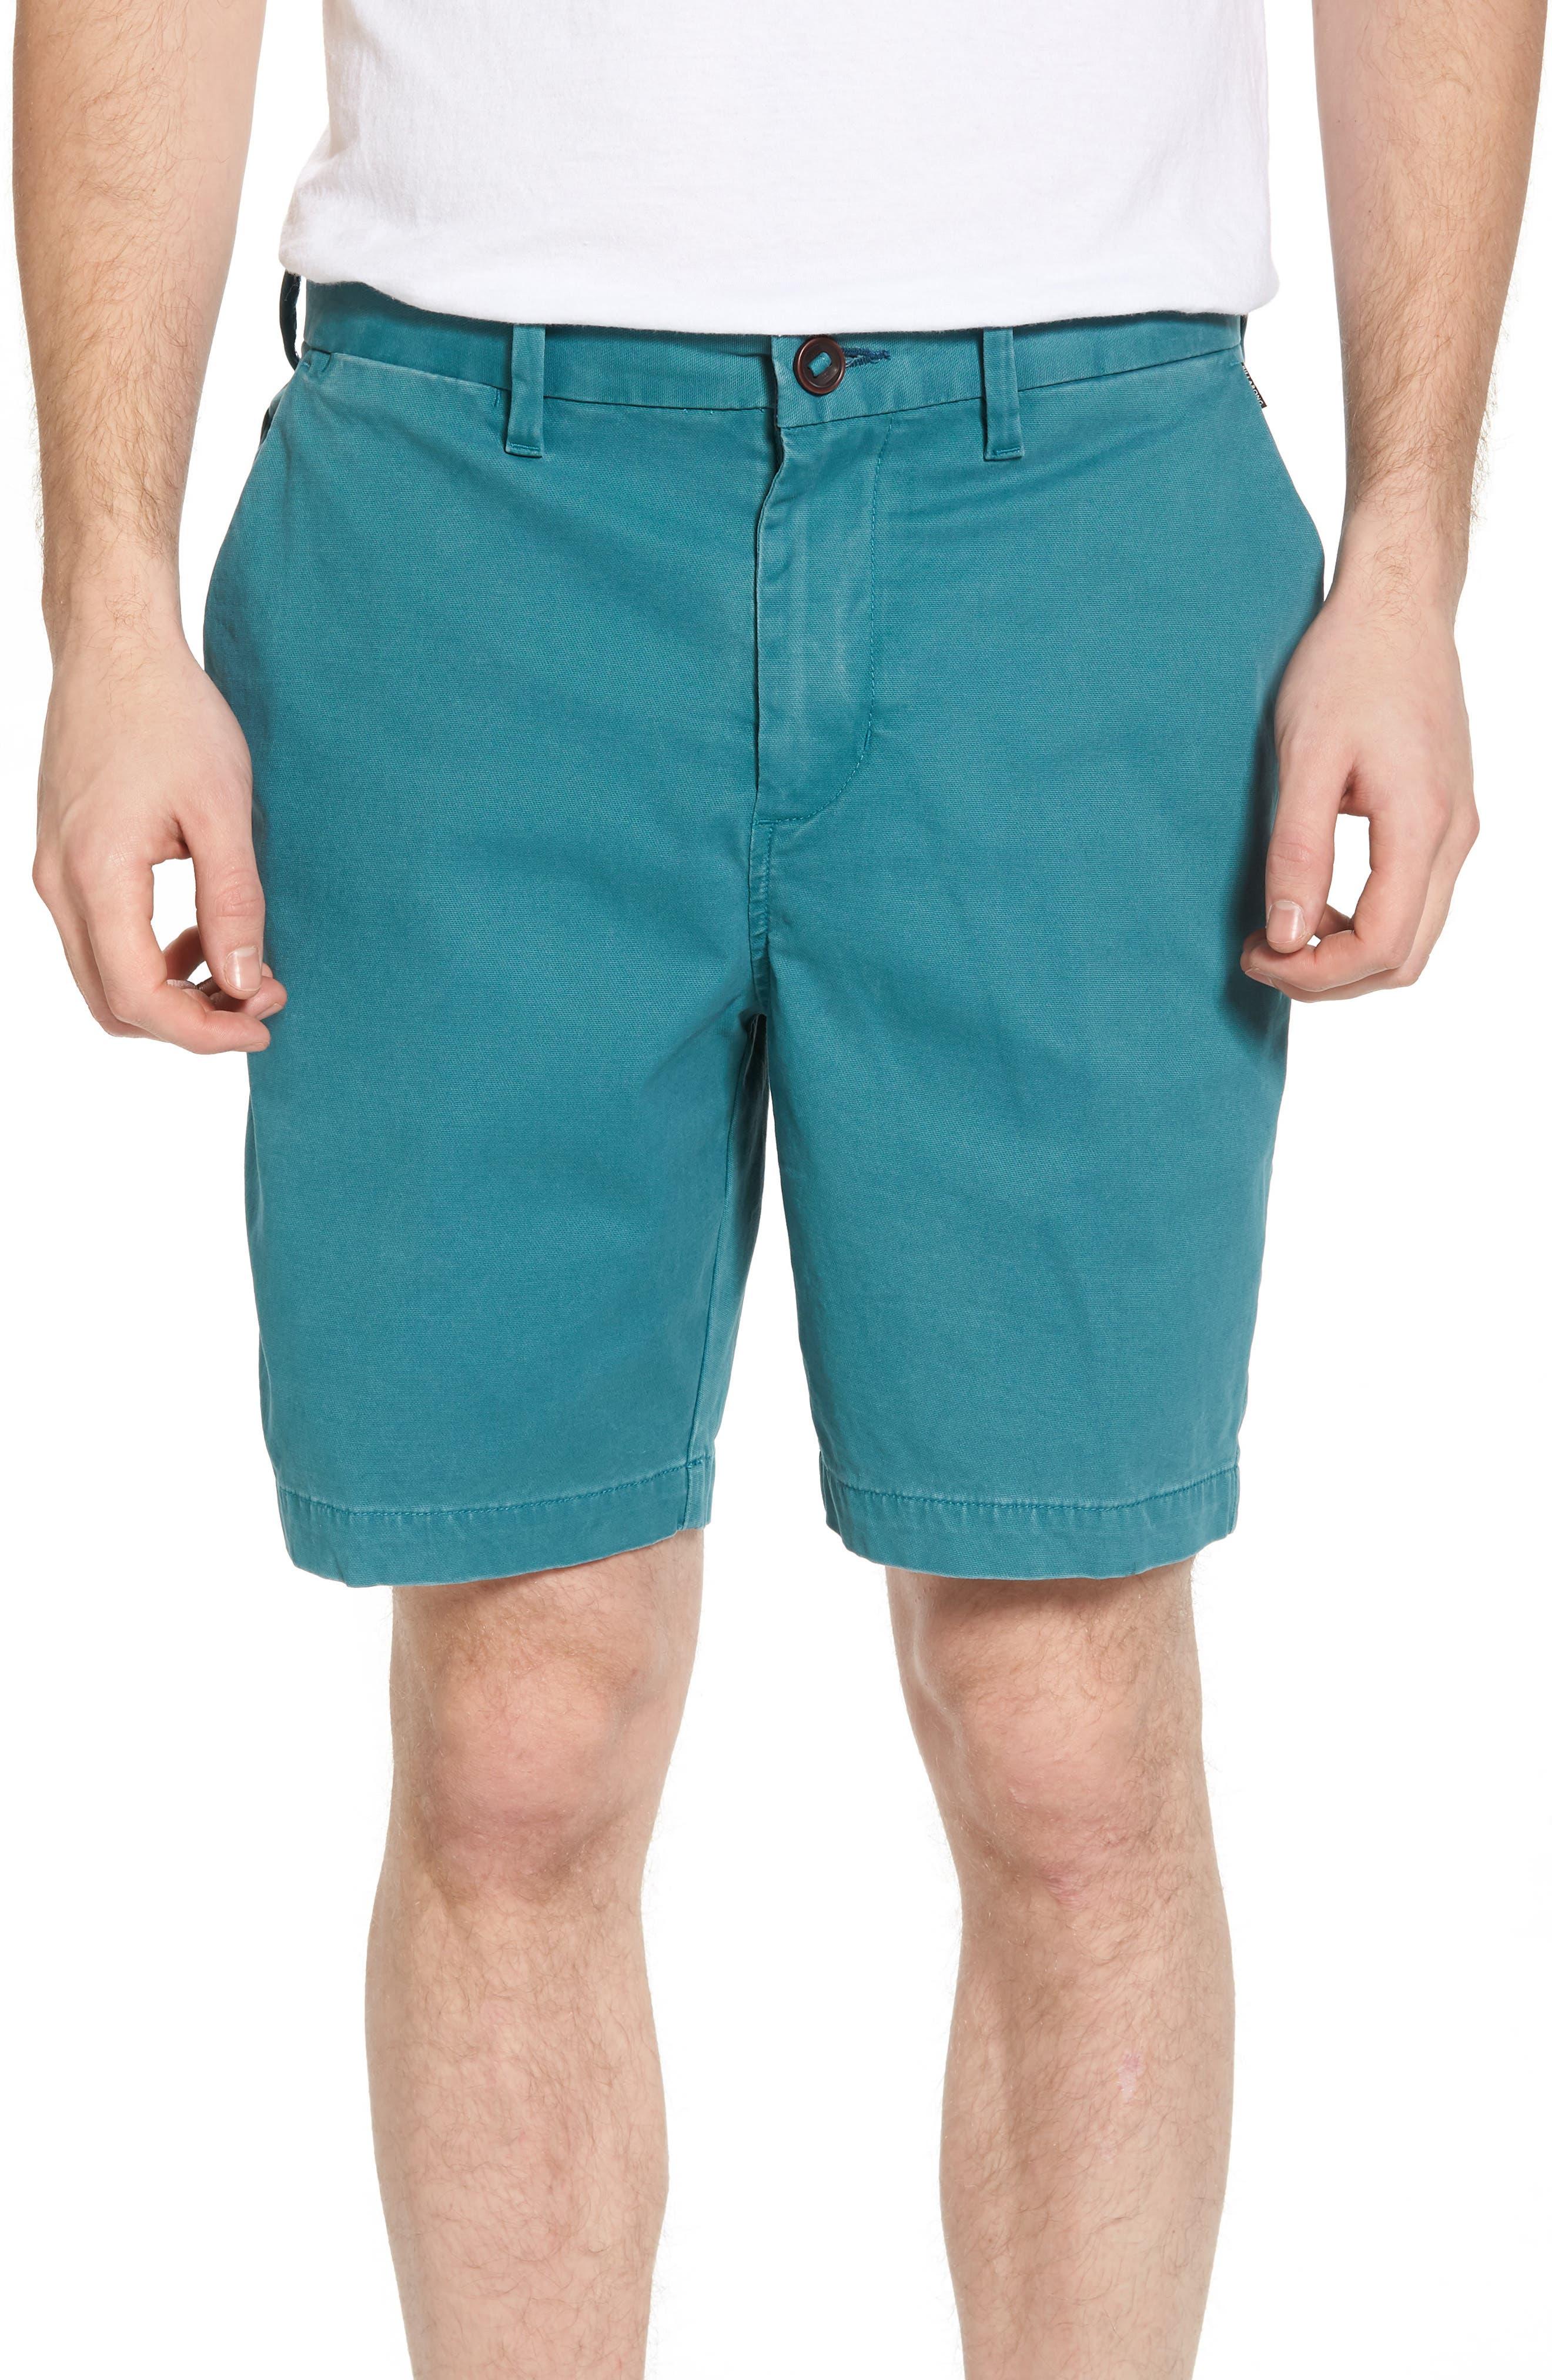 New Order Shorts,                         Main,                         color, Hydro